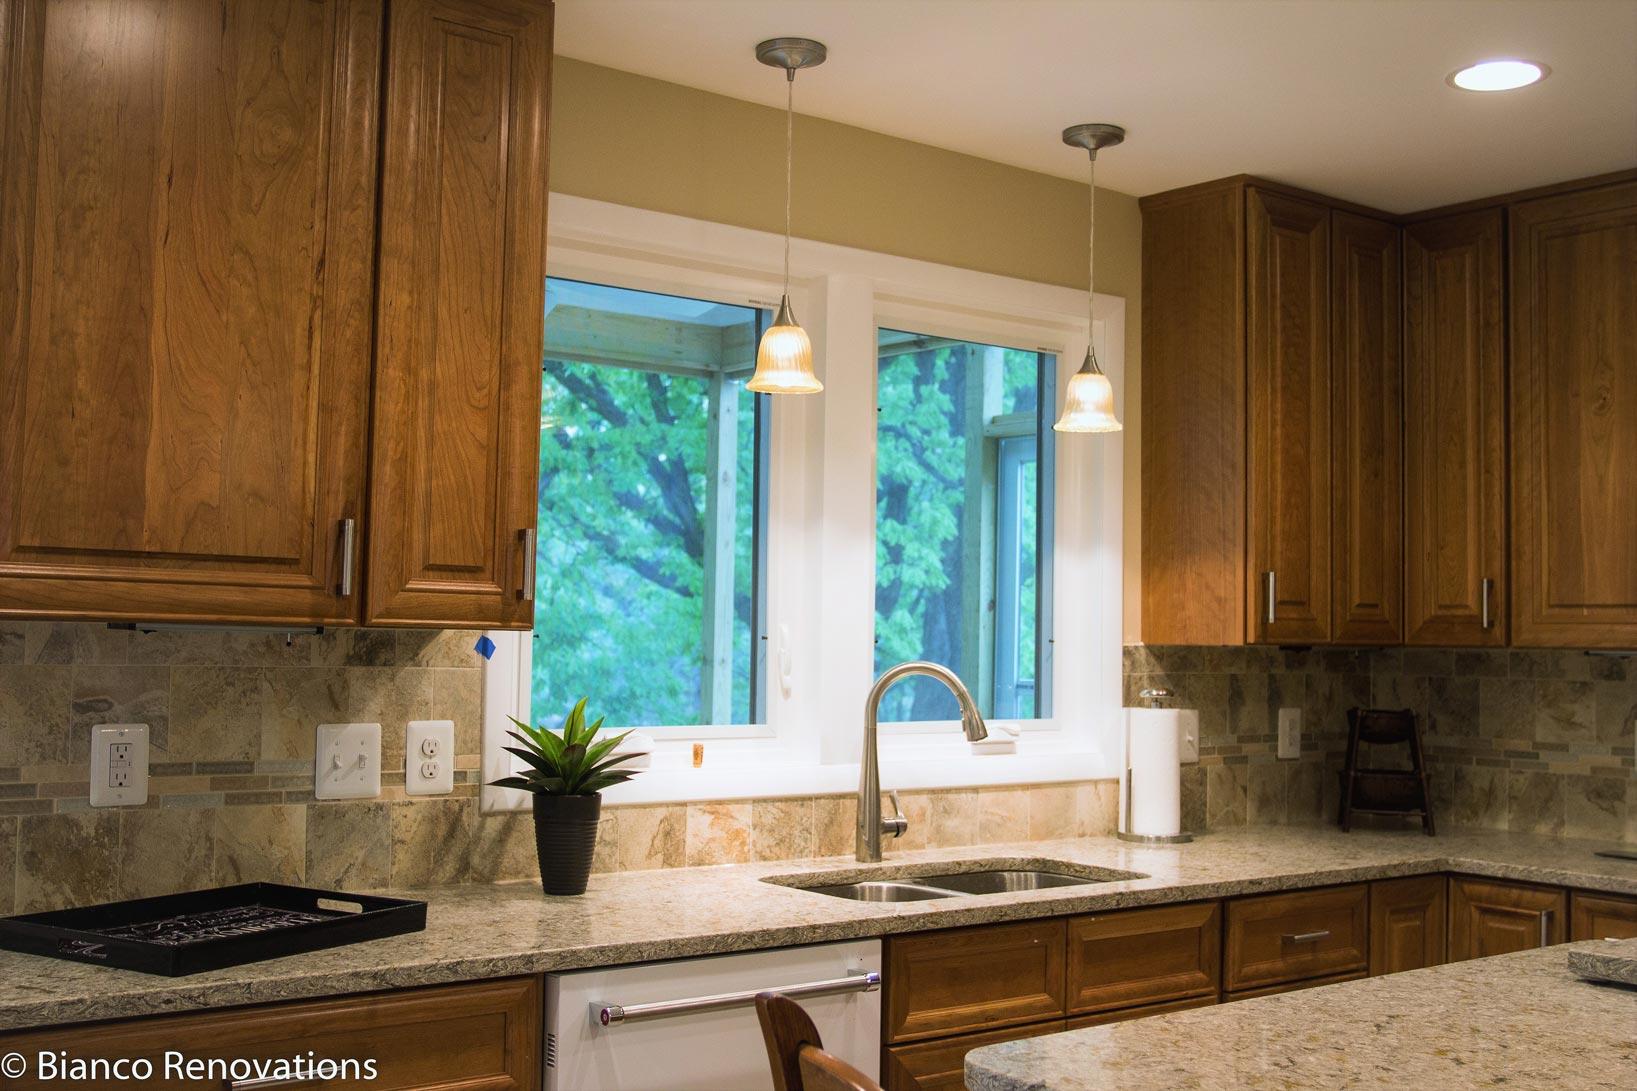 Home Addition in Alexandria, VA - Bianco Renovations